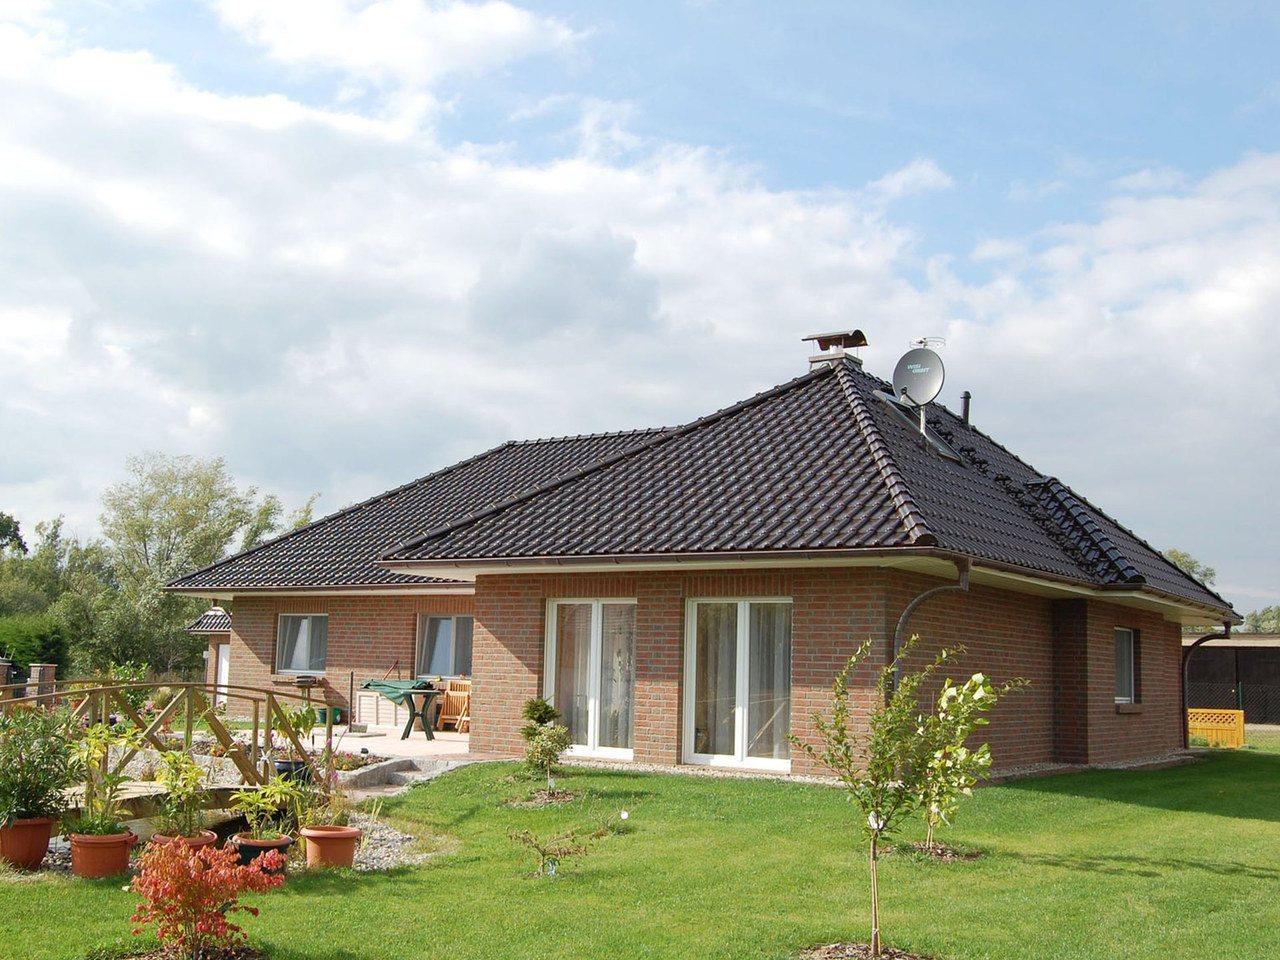 Rothenseer Baugesellschaft - Haus Am Deich Ansicht 3